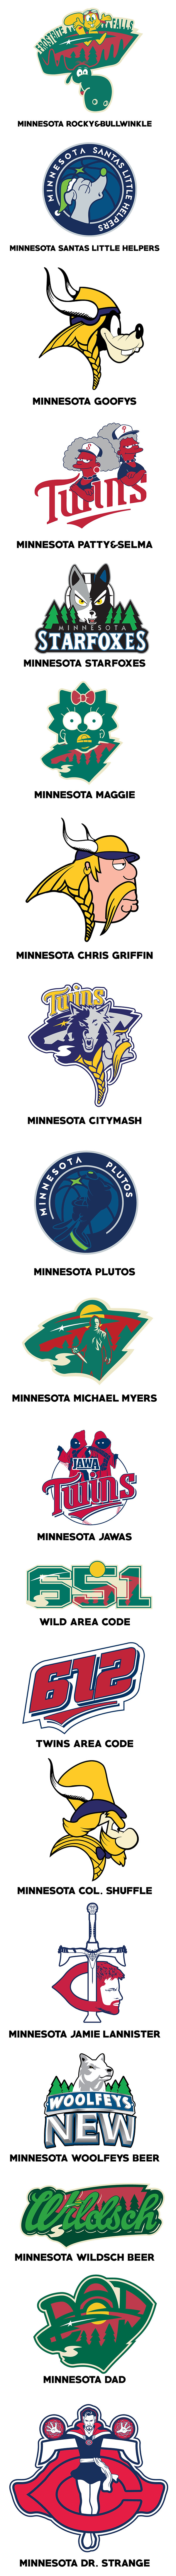 ALL_MASHUPS_Minnesota.jpg